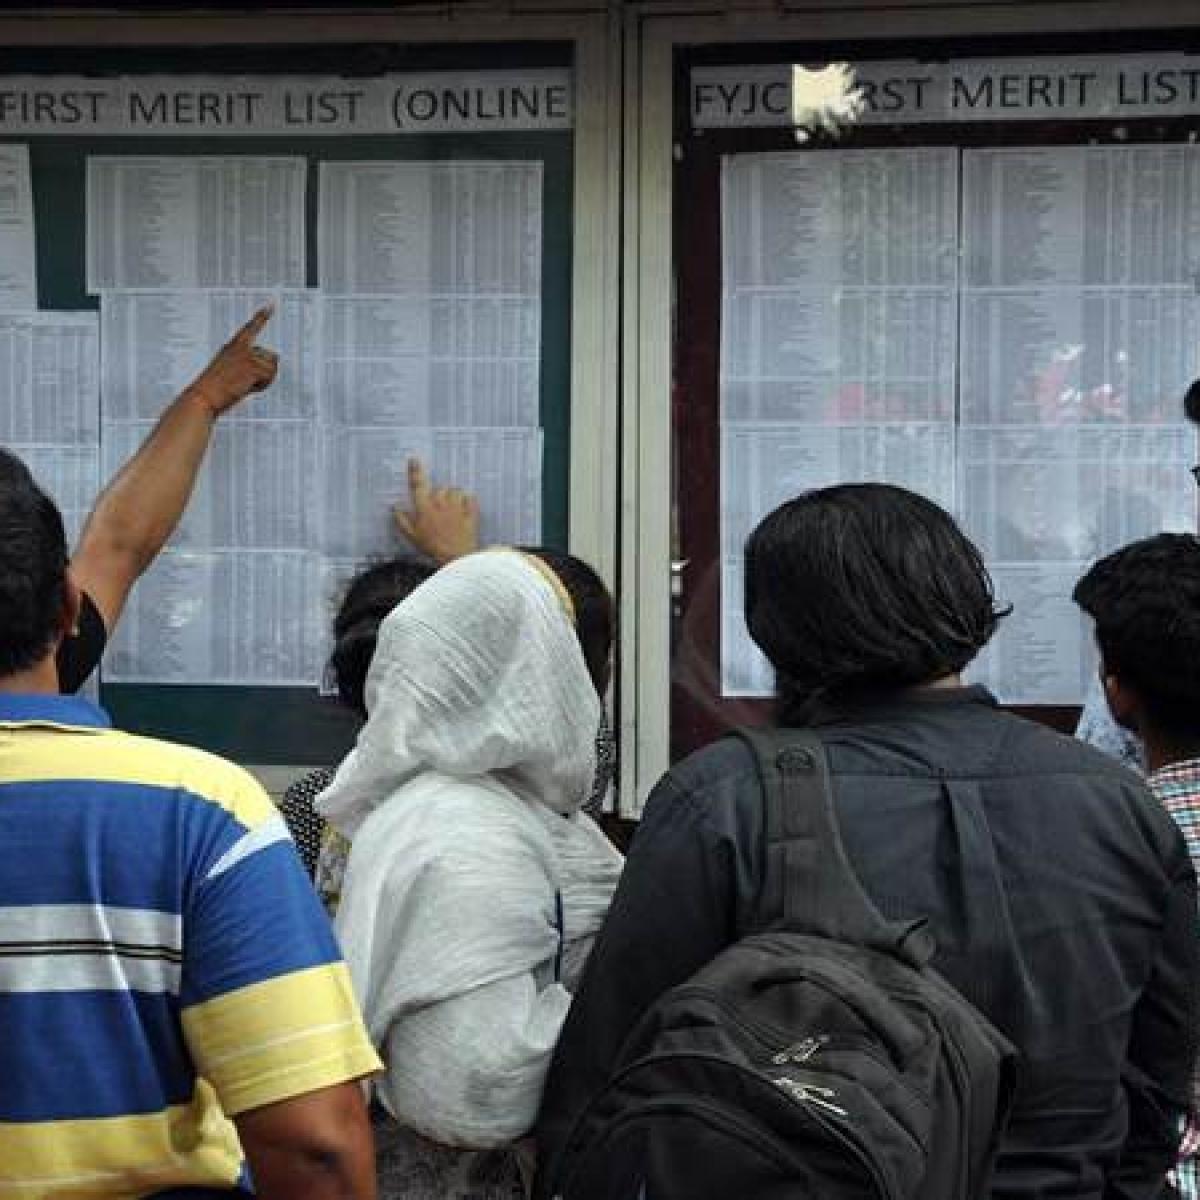 Mumbai FYJC first merit list released; check at mumbai.11thadmission.net